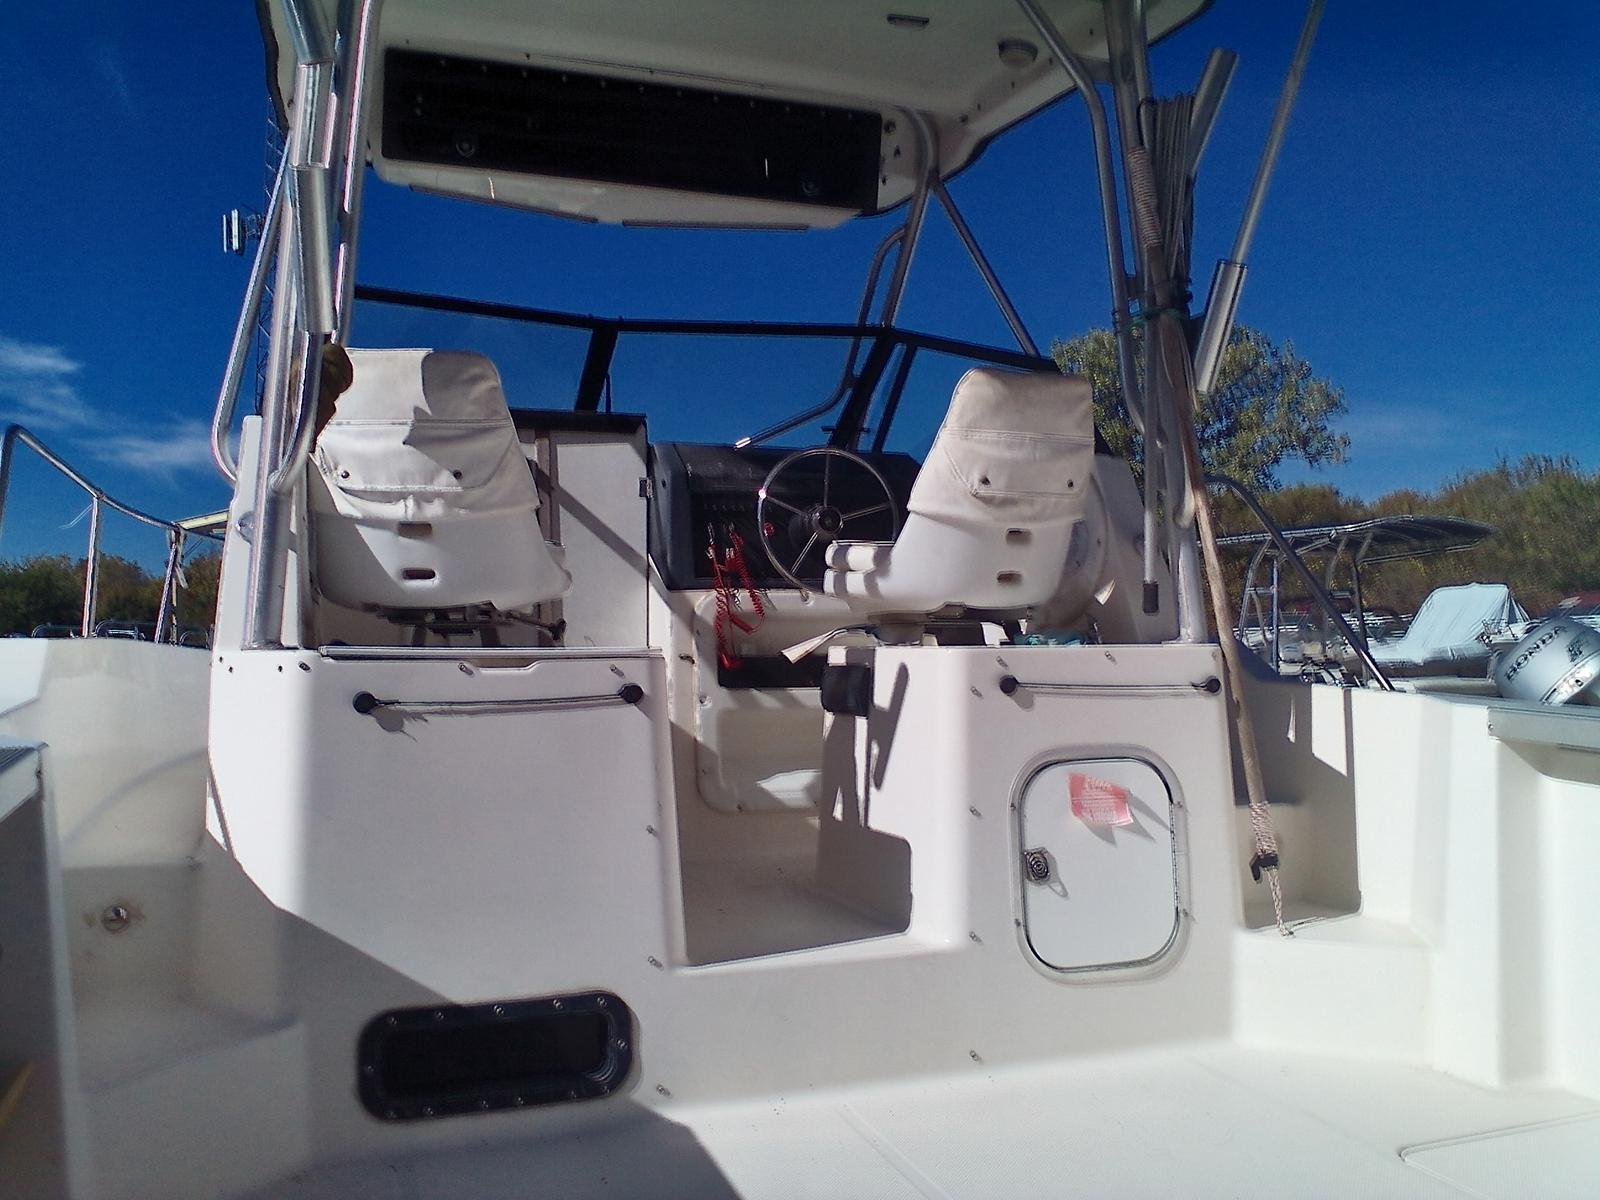 1996 Bayliner boat for sale, model of the boat is Trophy 2502 & Image # 3 of 10